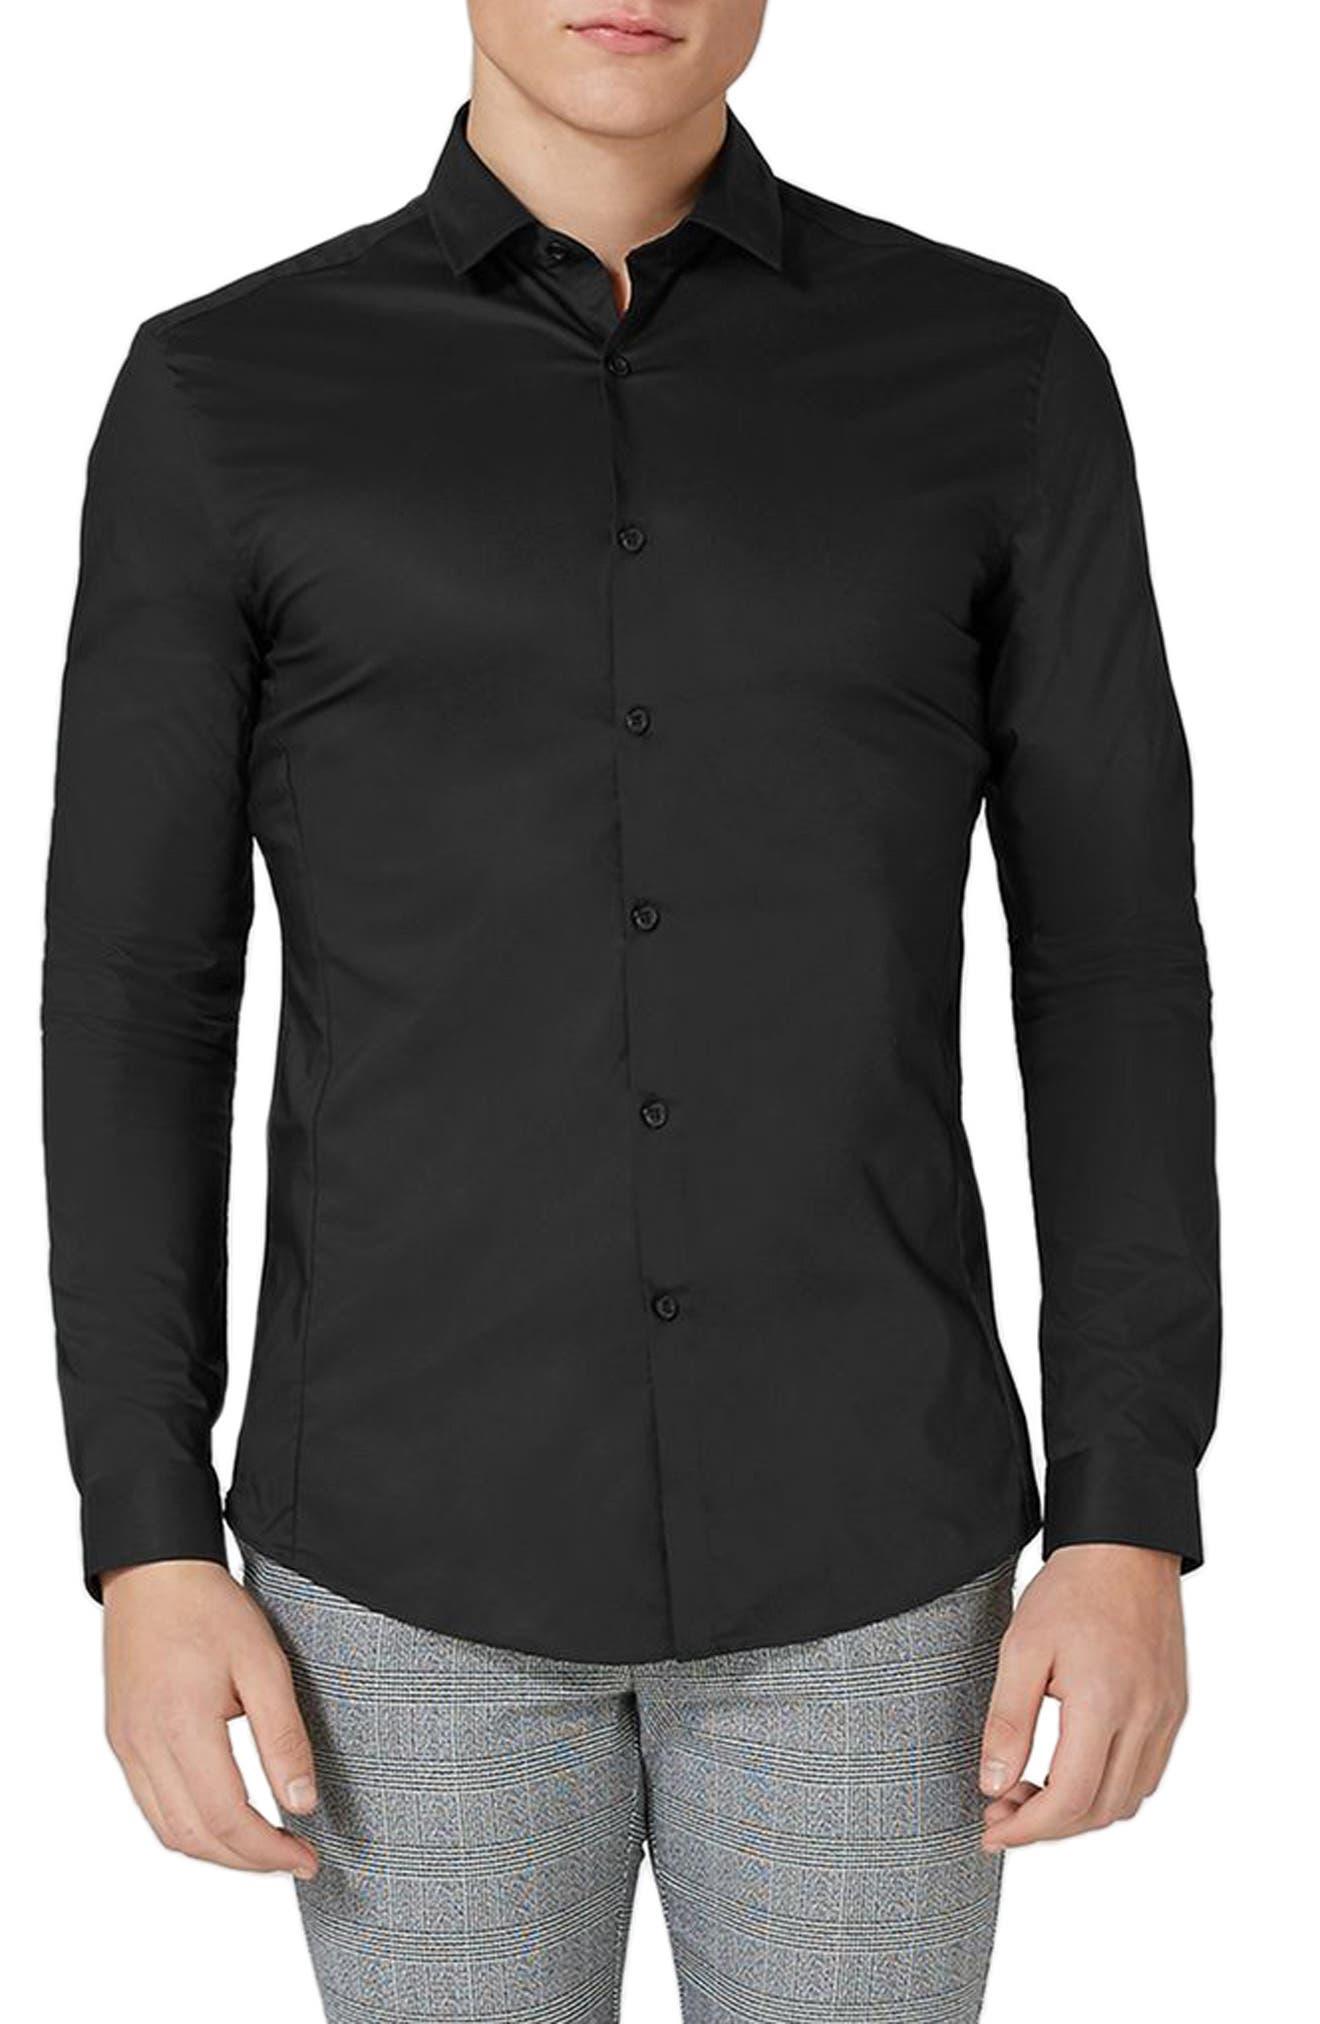 TOPMAN Muscle Fit Stretch Poplin Shirt, Main, color, BLACK